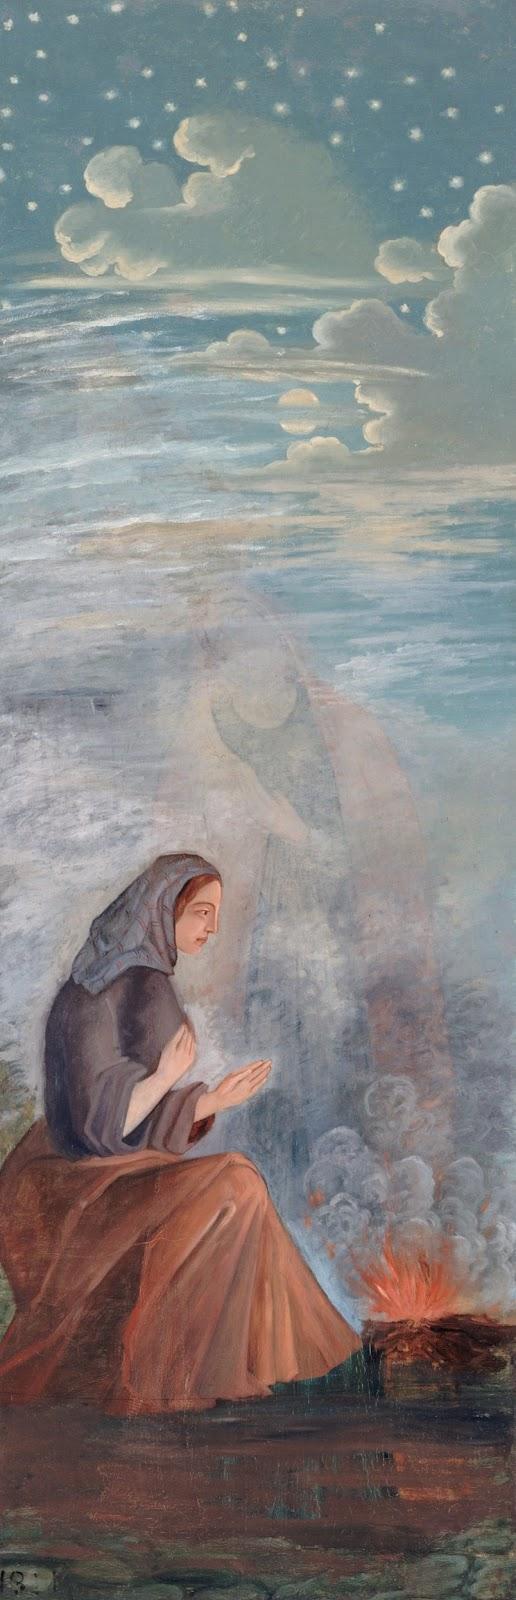 Paul Cézanne ~ The Four Seasons -Winter, 1861